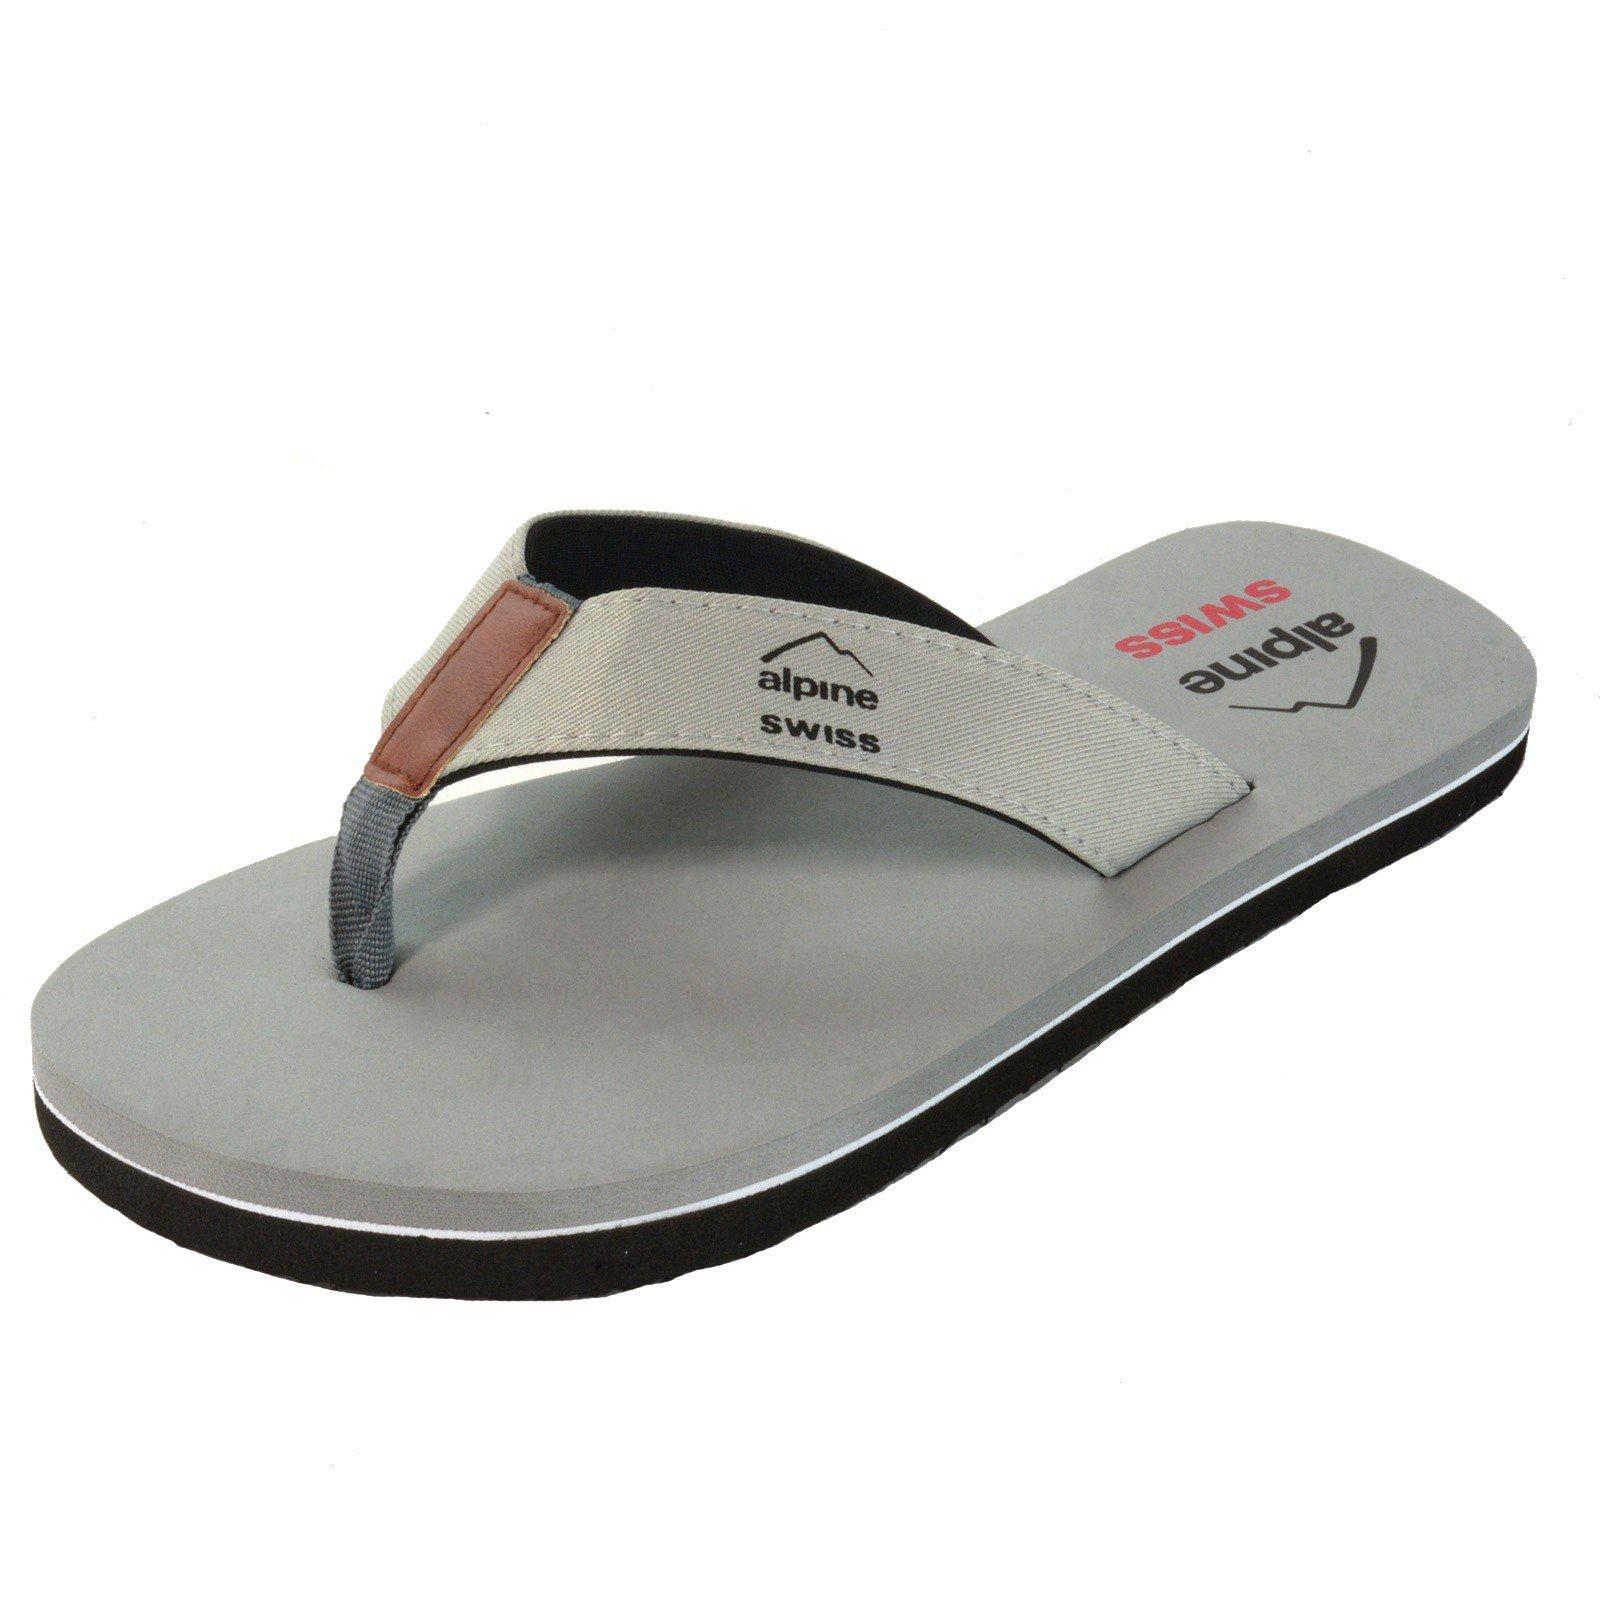 alpine swiss Sandals Comfort Thongs